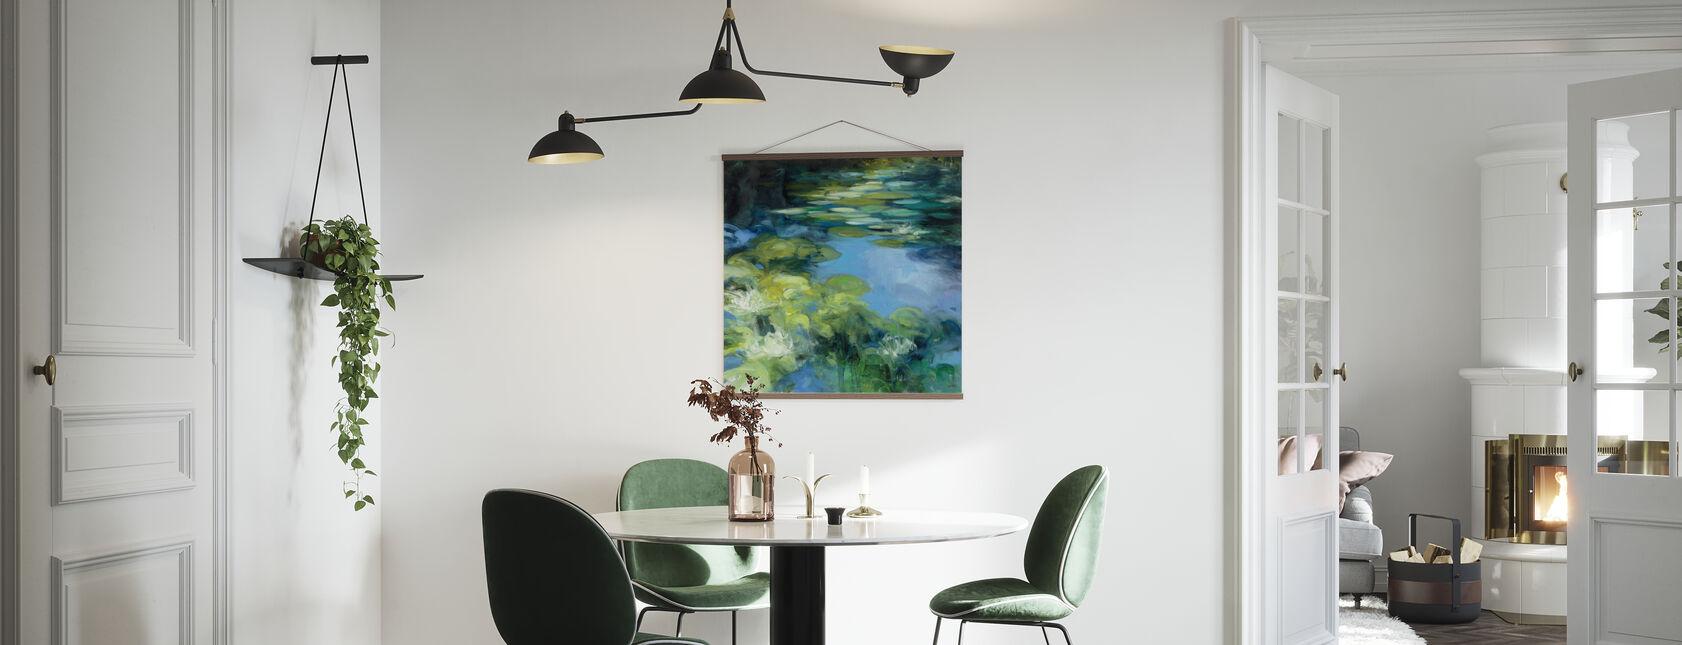 Seerosen II - Poster - Küchen